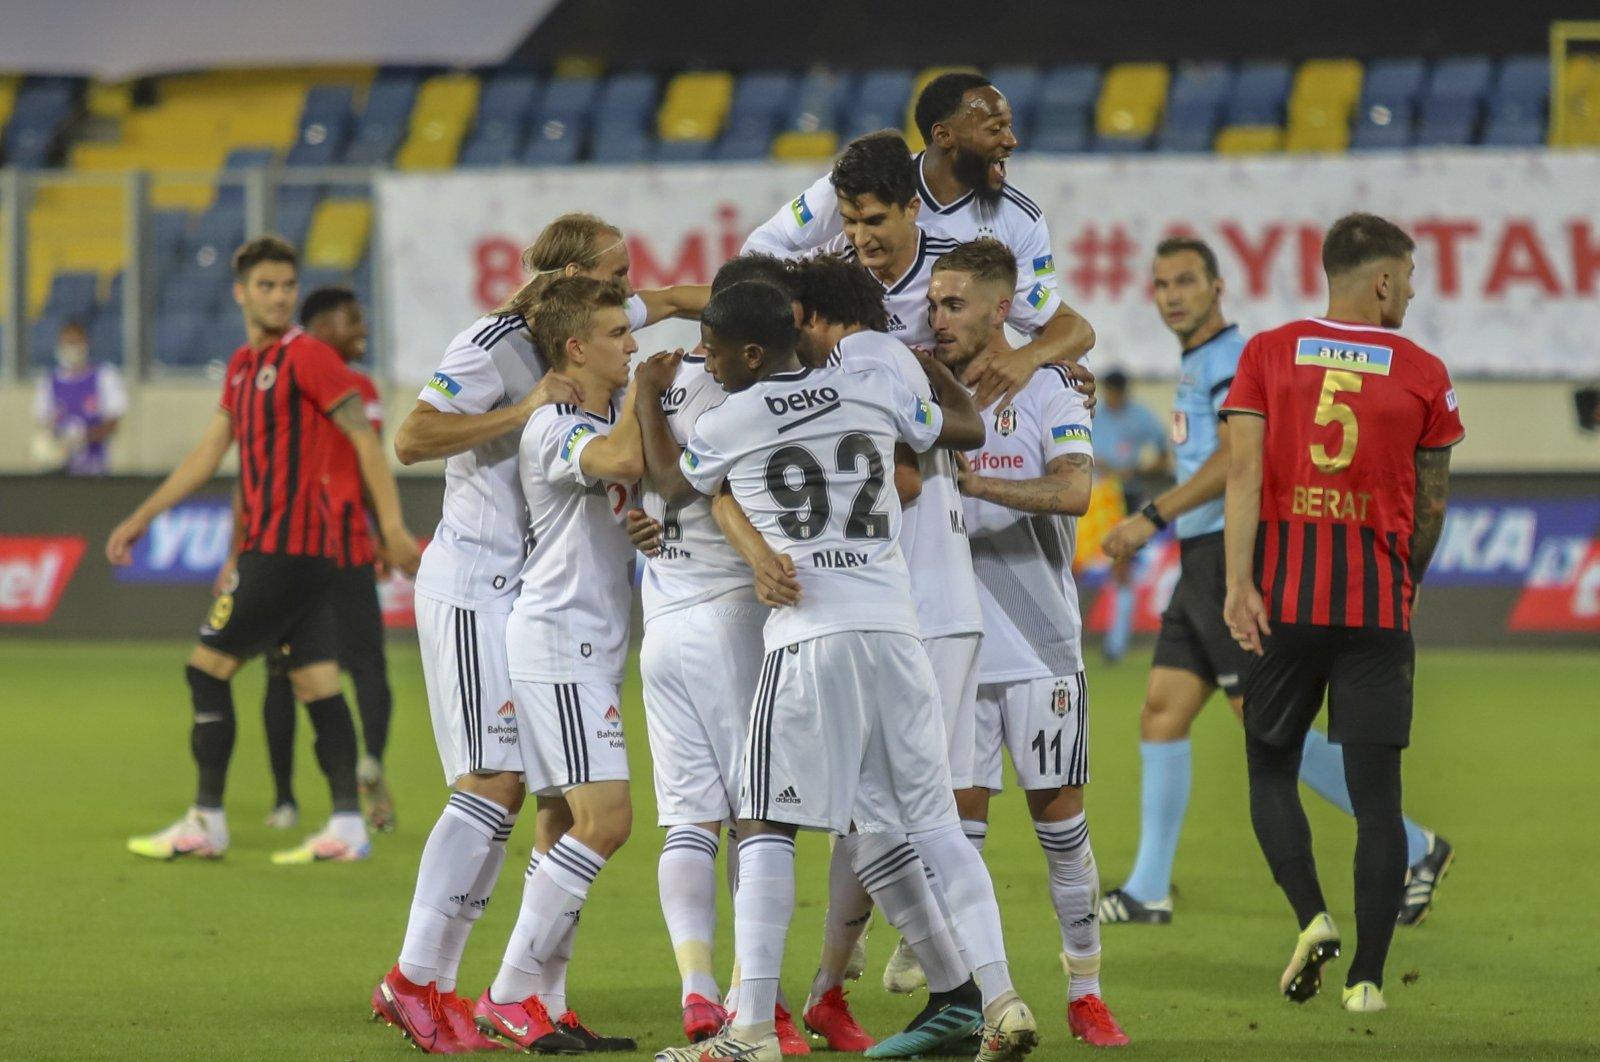 Beşiktaş players celebrate after defeating Gençlerbirliği 3-0 in Ankara, Turkey, July 25, 2020. (IHA Photo)